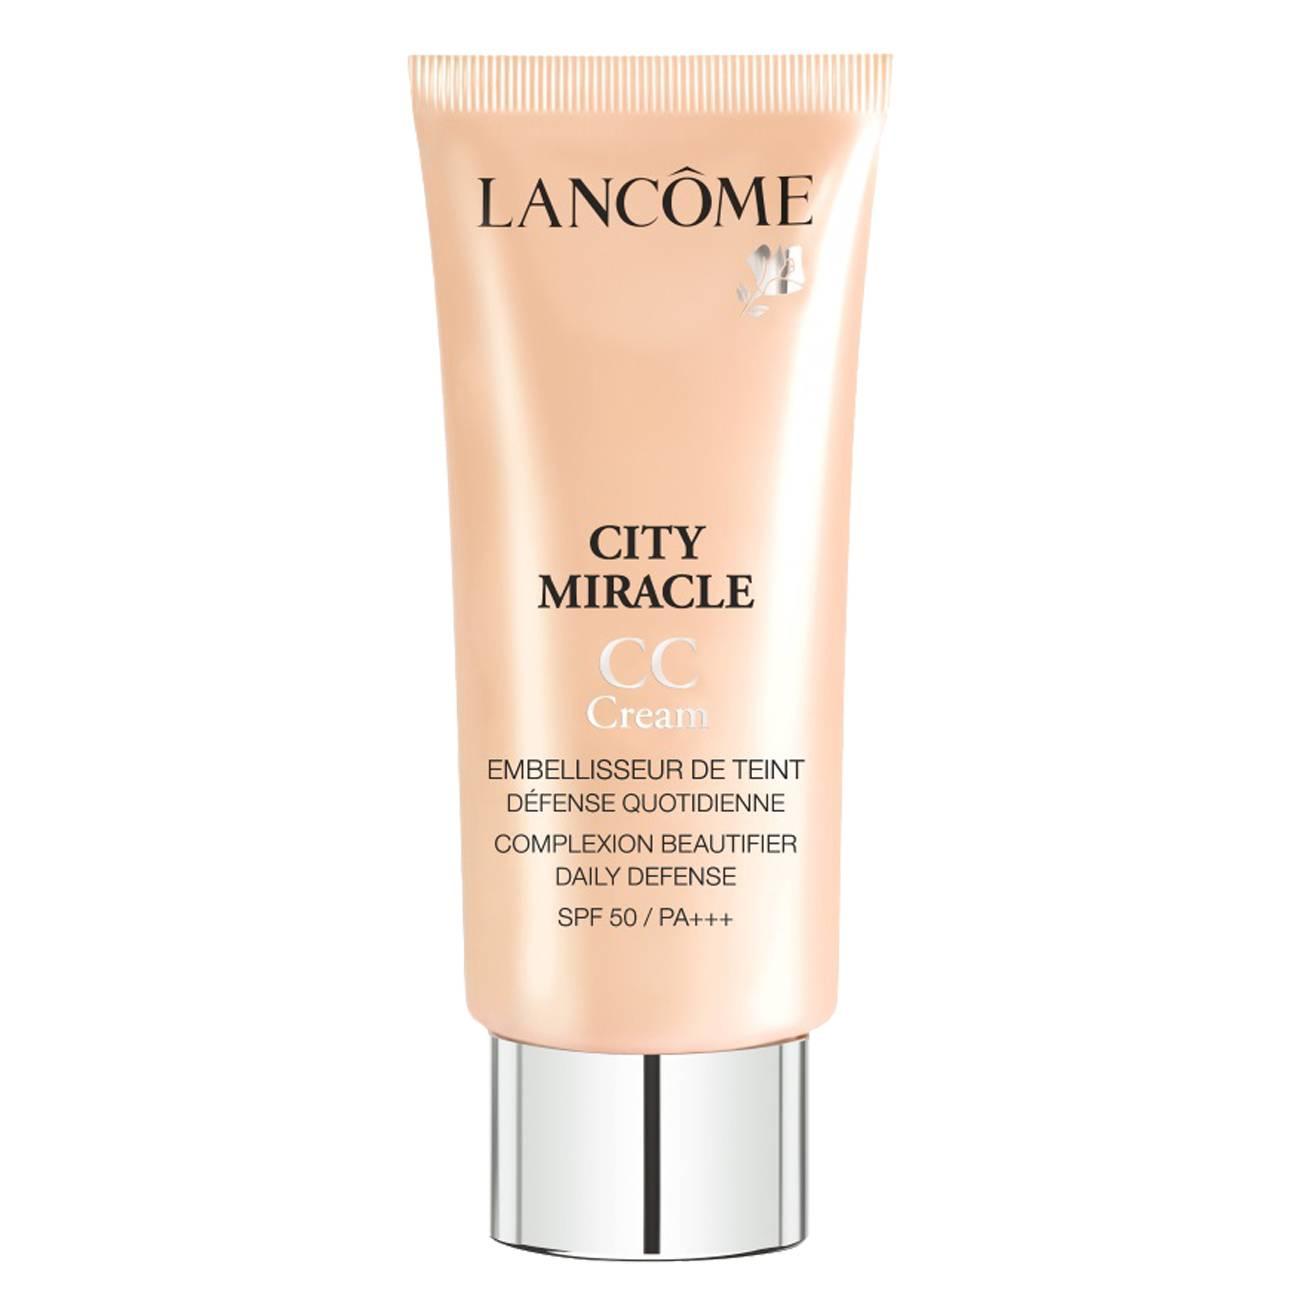 City Miracle Cc Cream 30 Ml Lancôme imagine 2021 bestvalue.eu